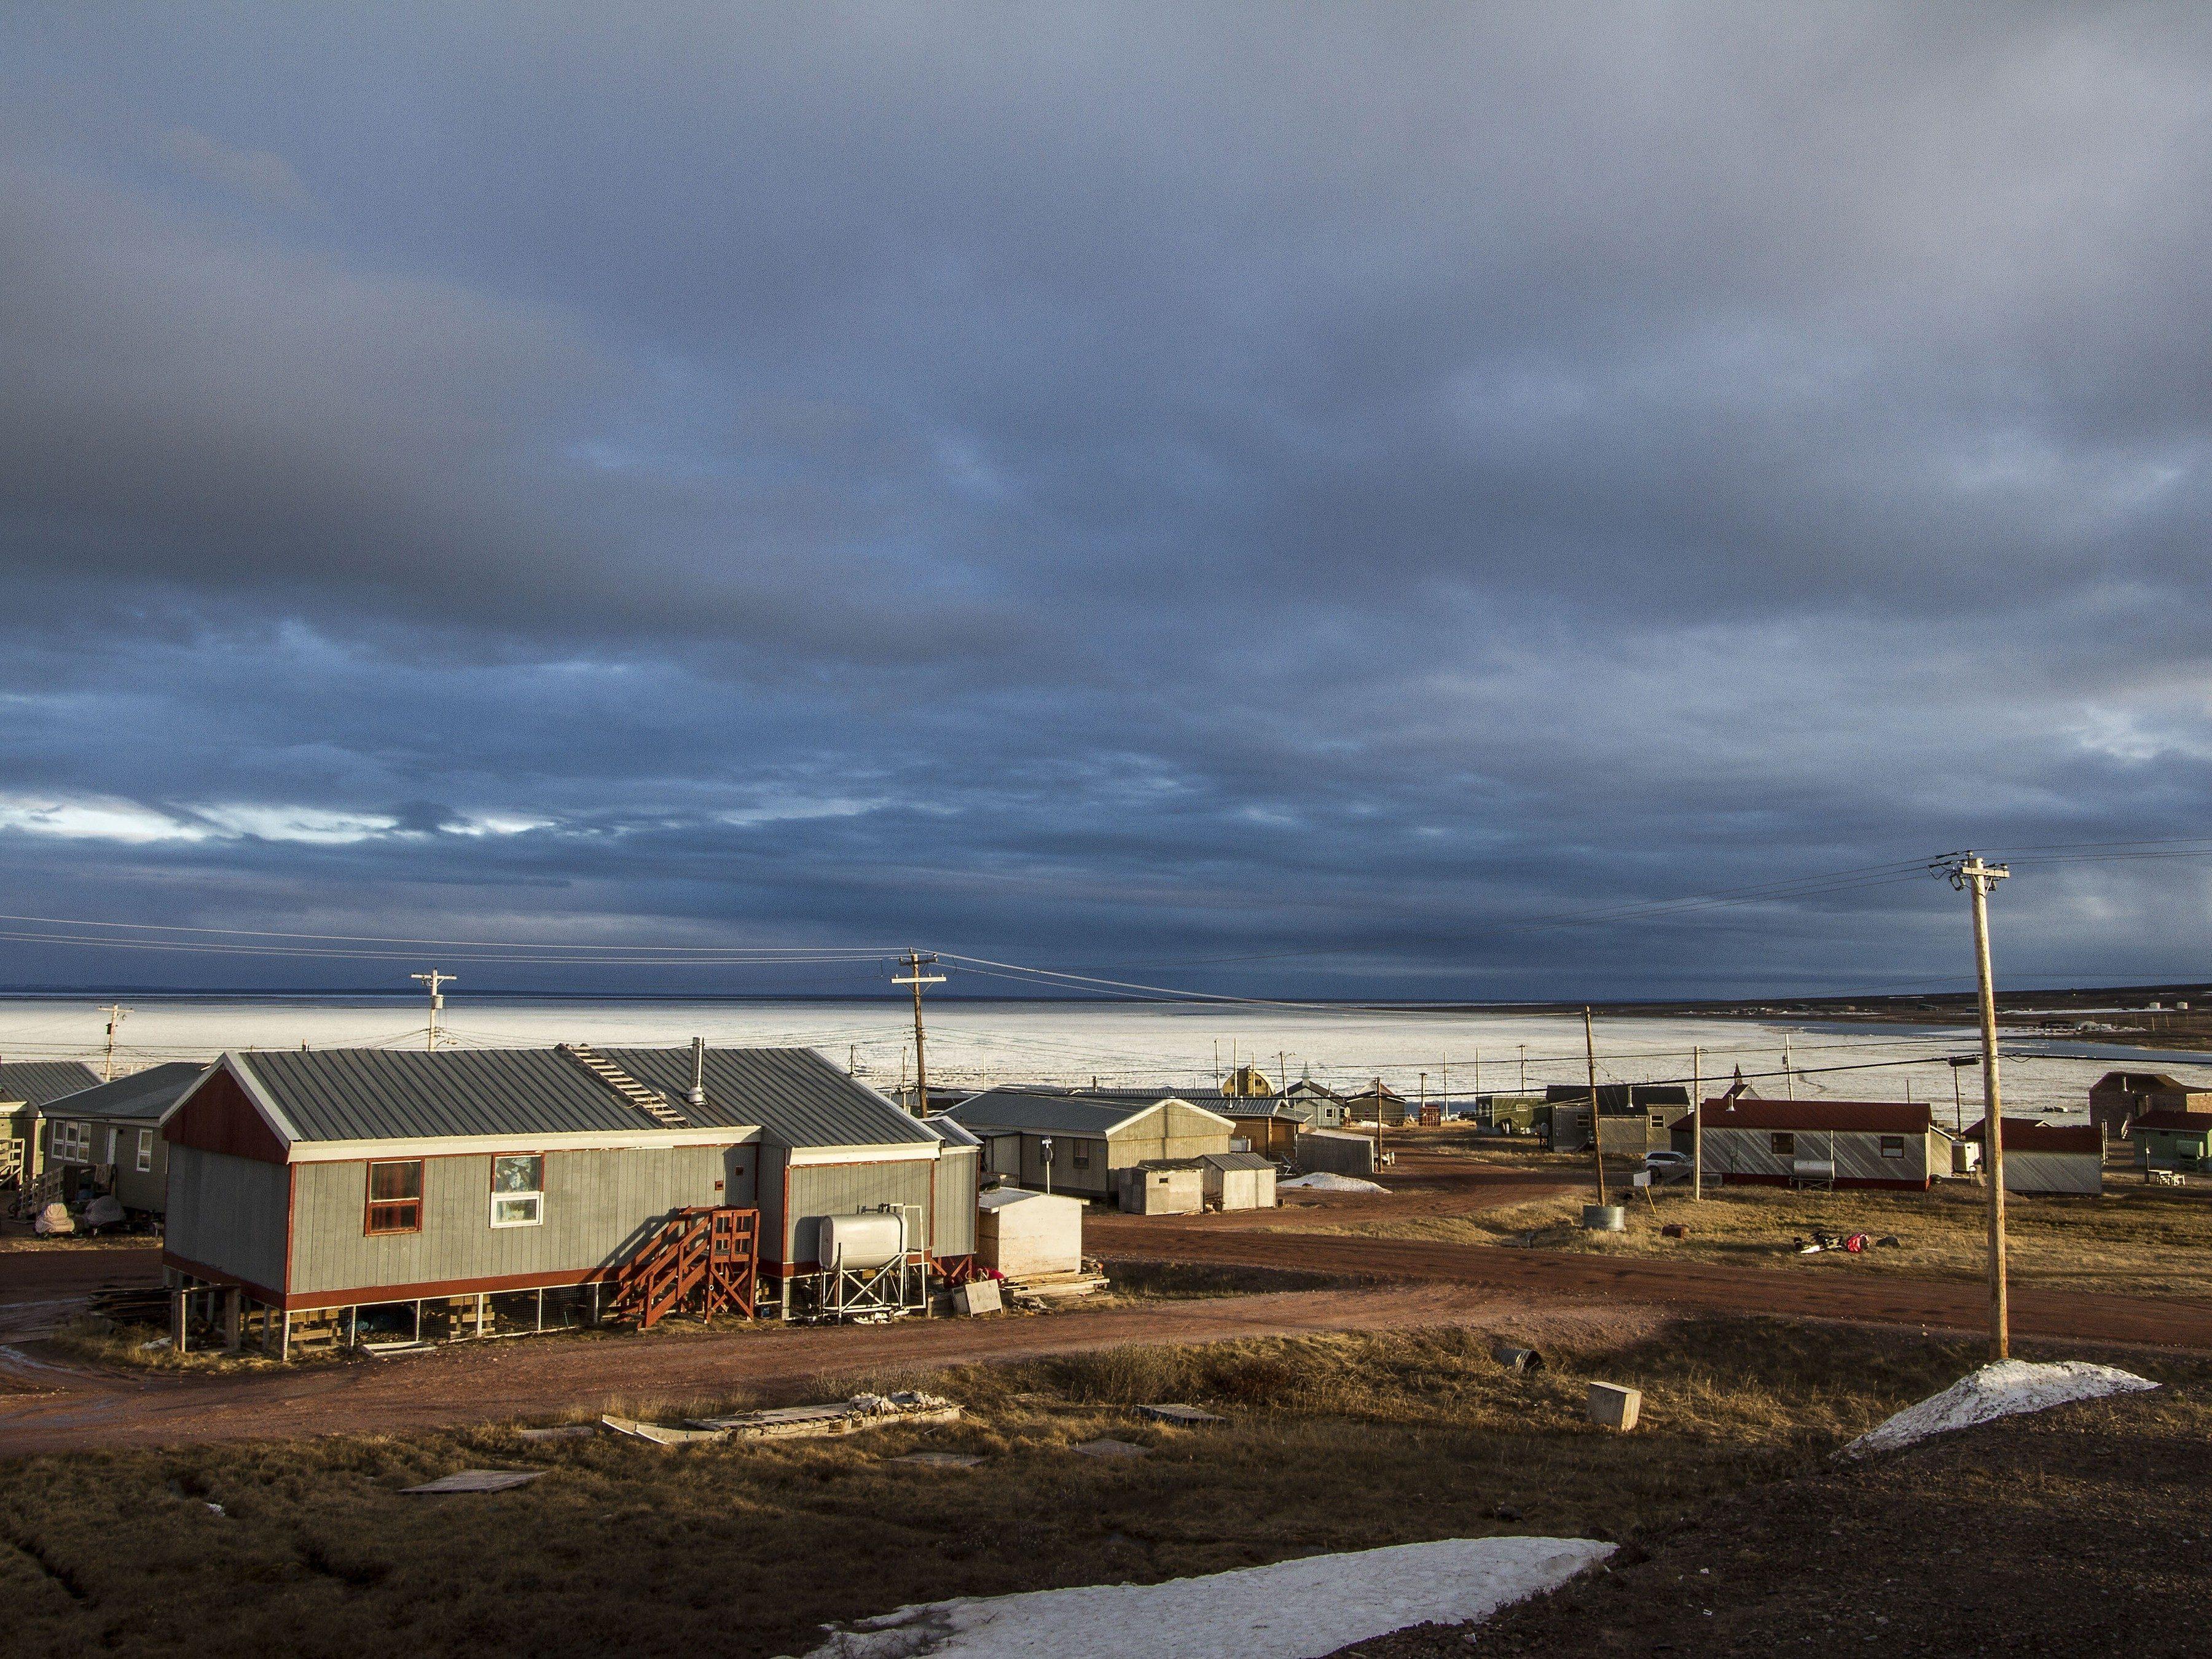 8. Baker Lake, Nunavut